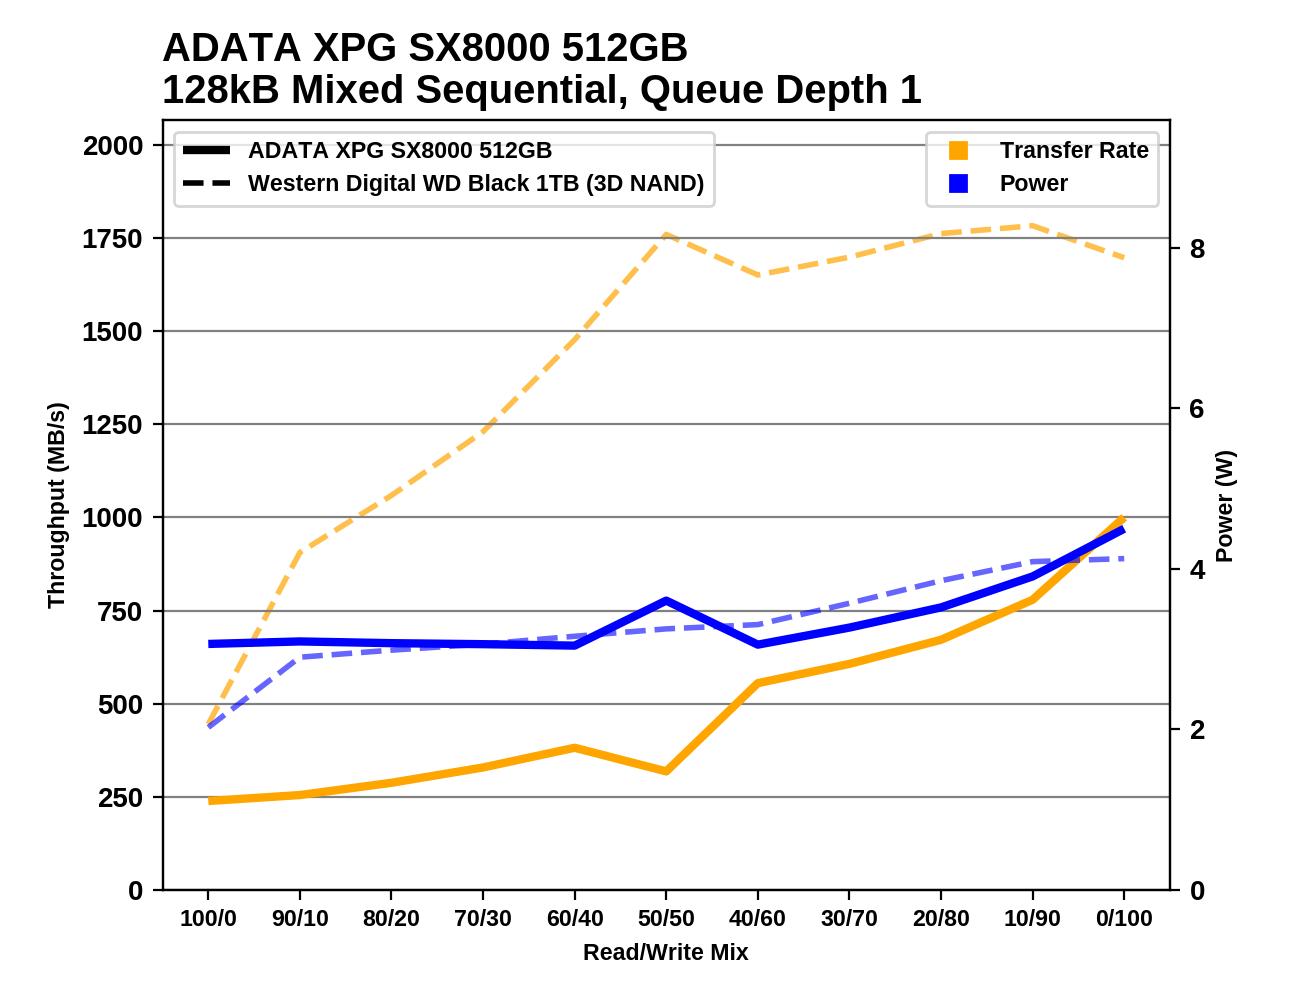 Обзор Western Digital WD Black 3D NAND SSD: EVO встретил равного - 138